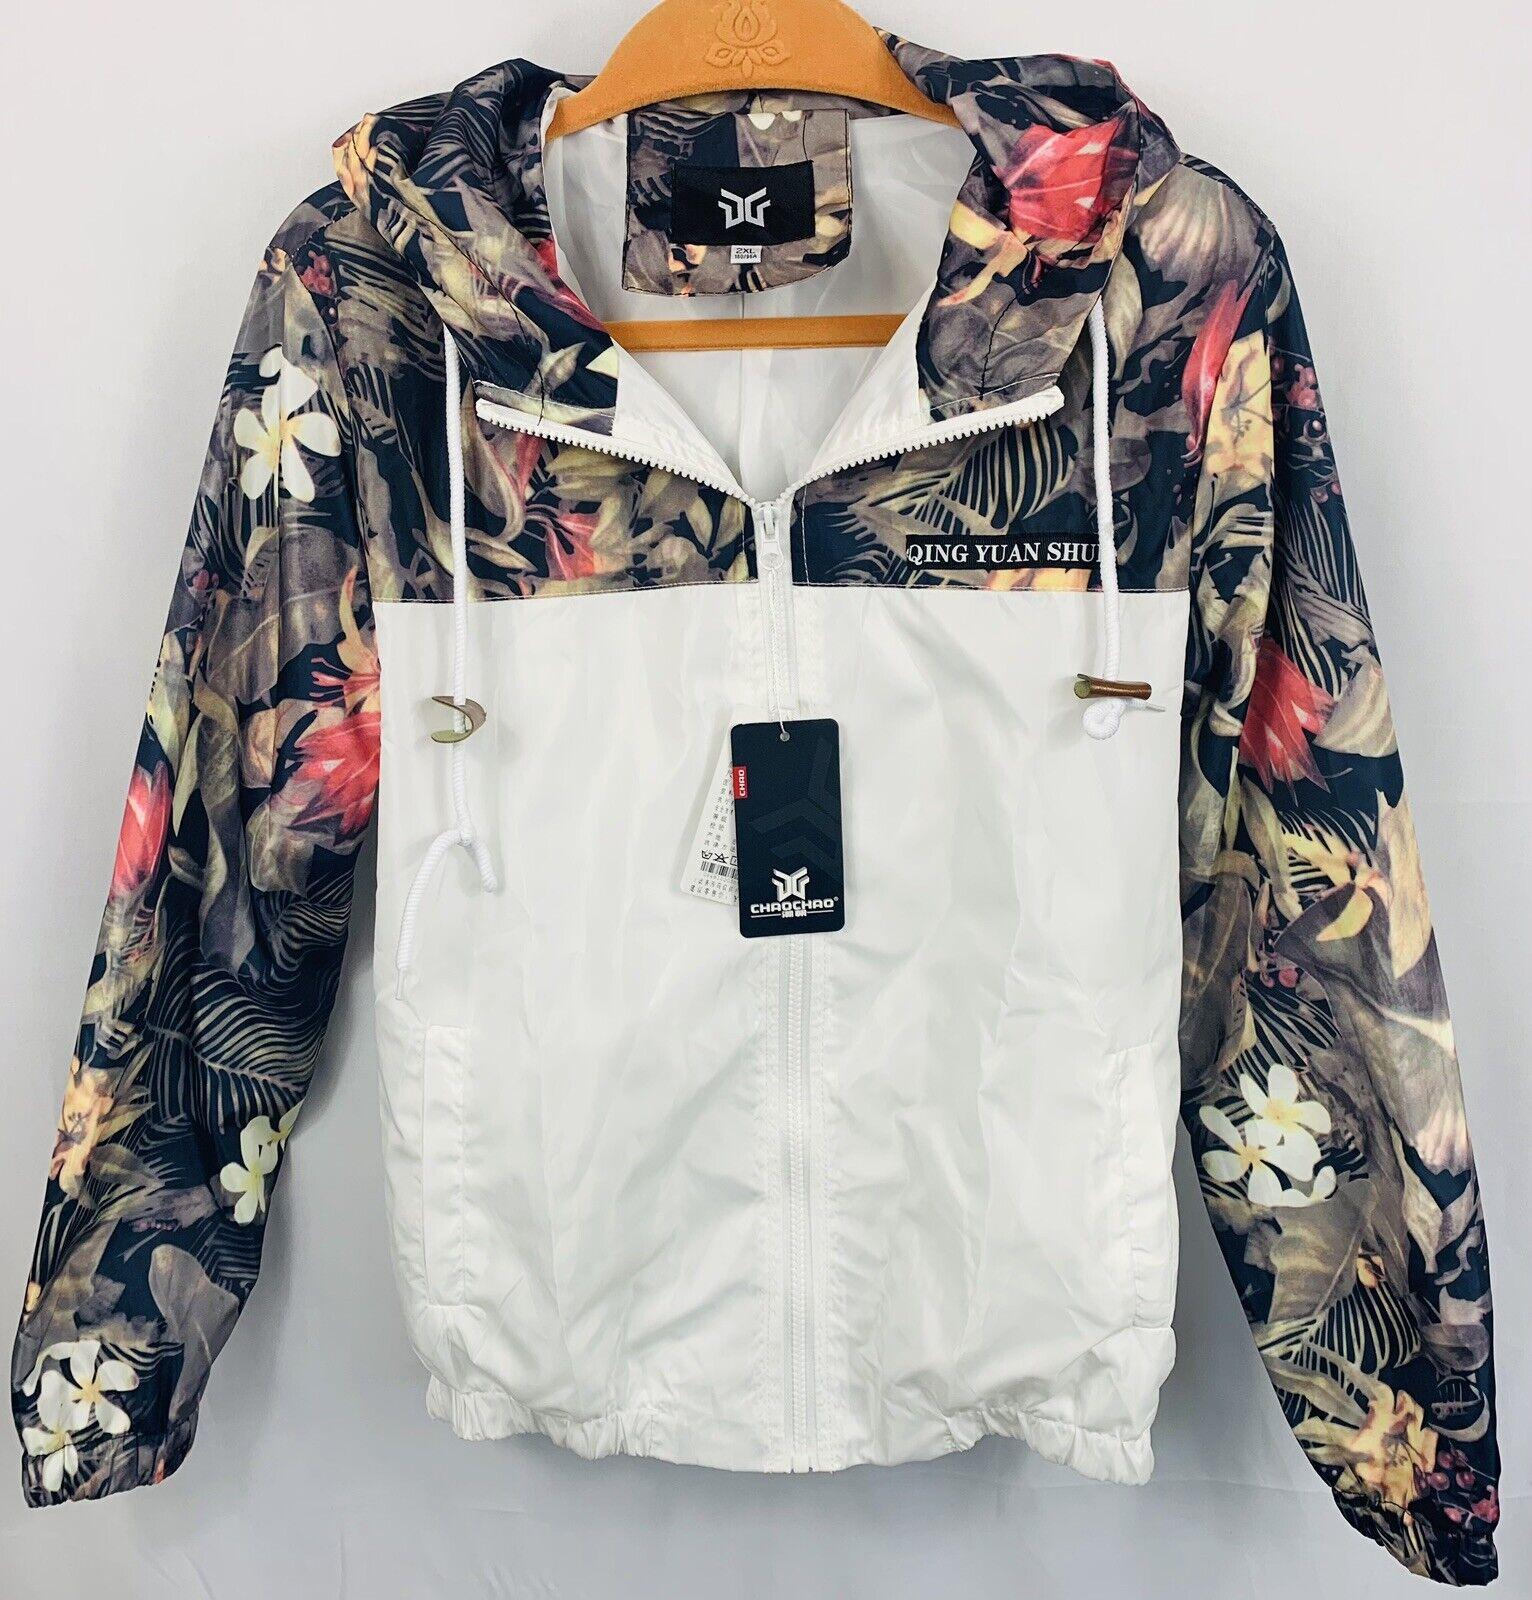 NWTQing Yuan Shui Windbreaker Jacket Floral & White Youth 2XL or WOMENS Sz Small